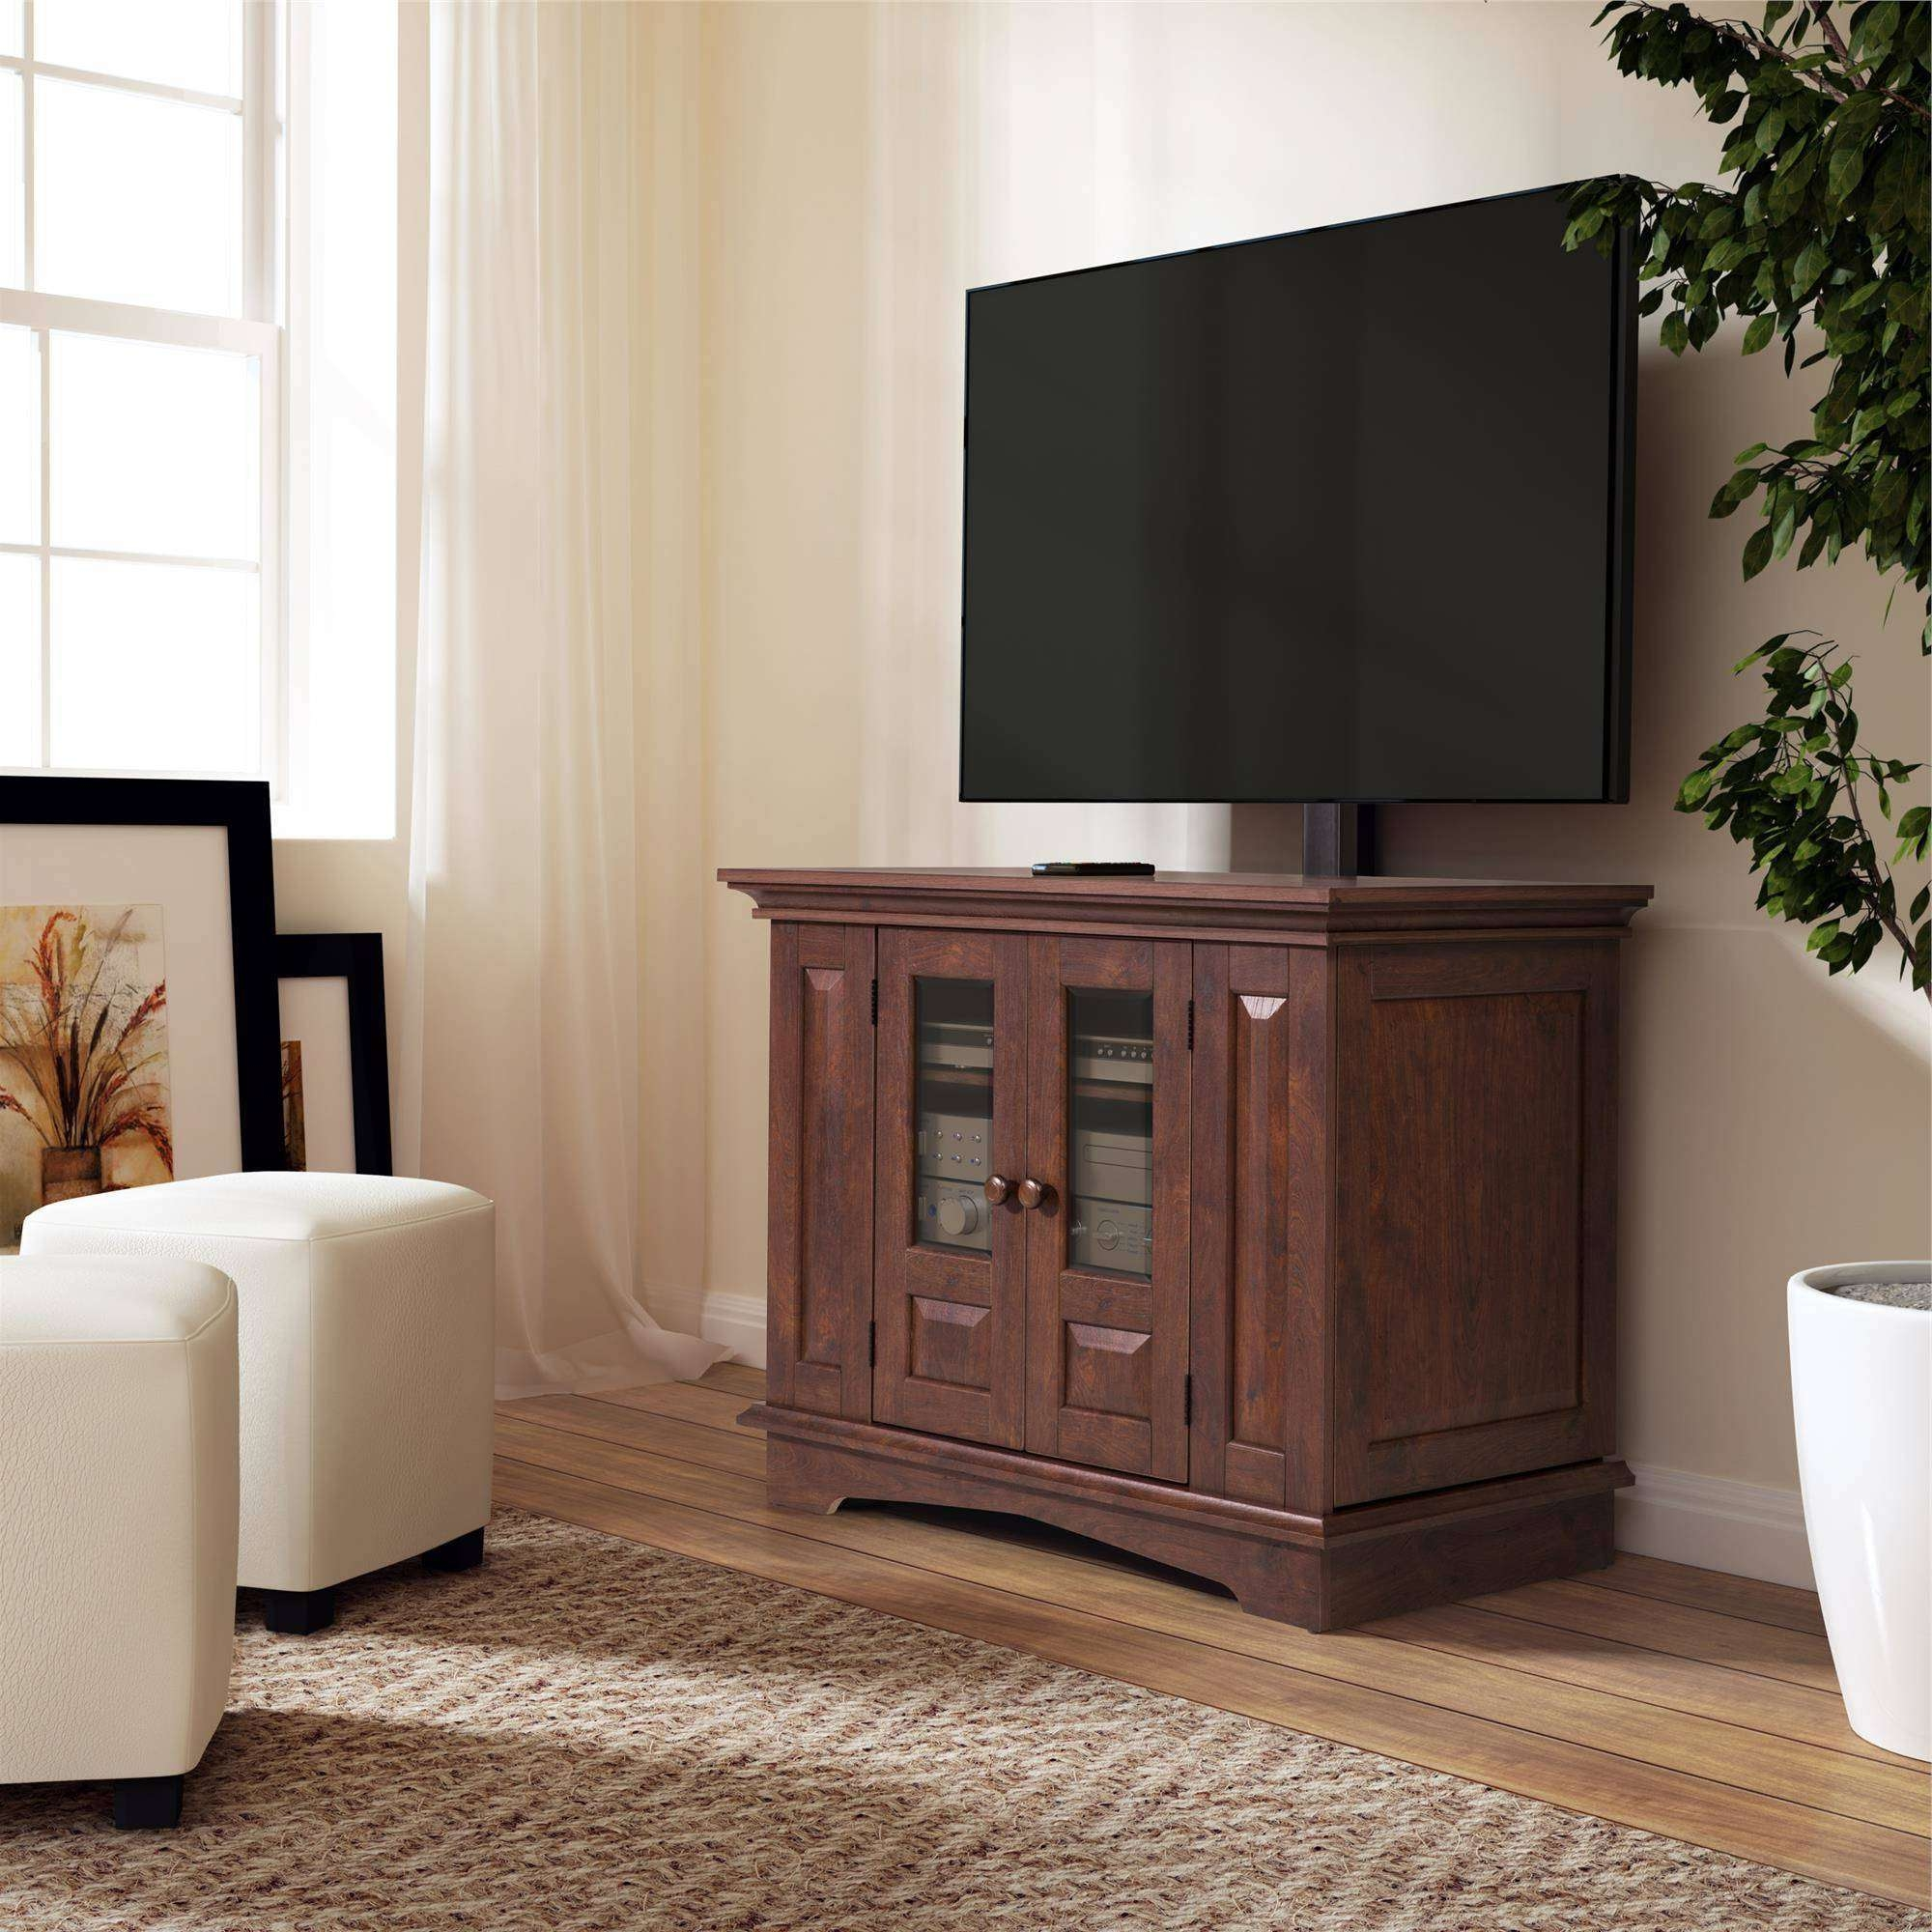 Tv : Amazing Cherry Wood Tv Cabinets Better Homes And Gardens Inside Cherry Wood Tv Cabinets (View 10 of 20)